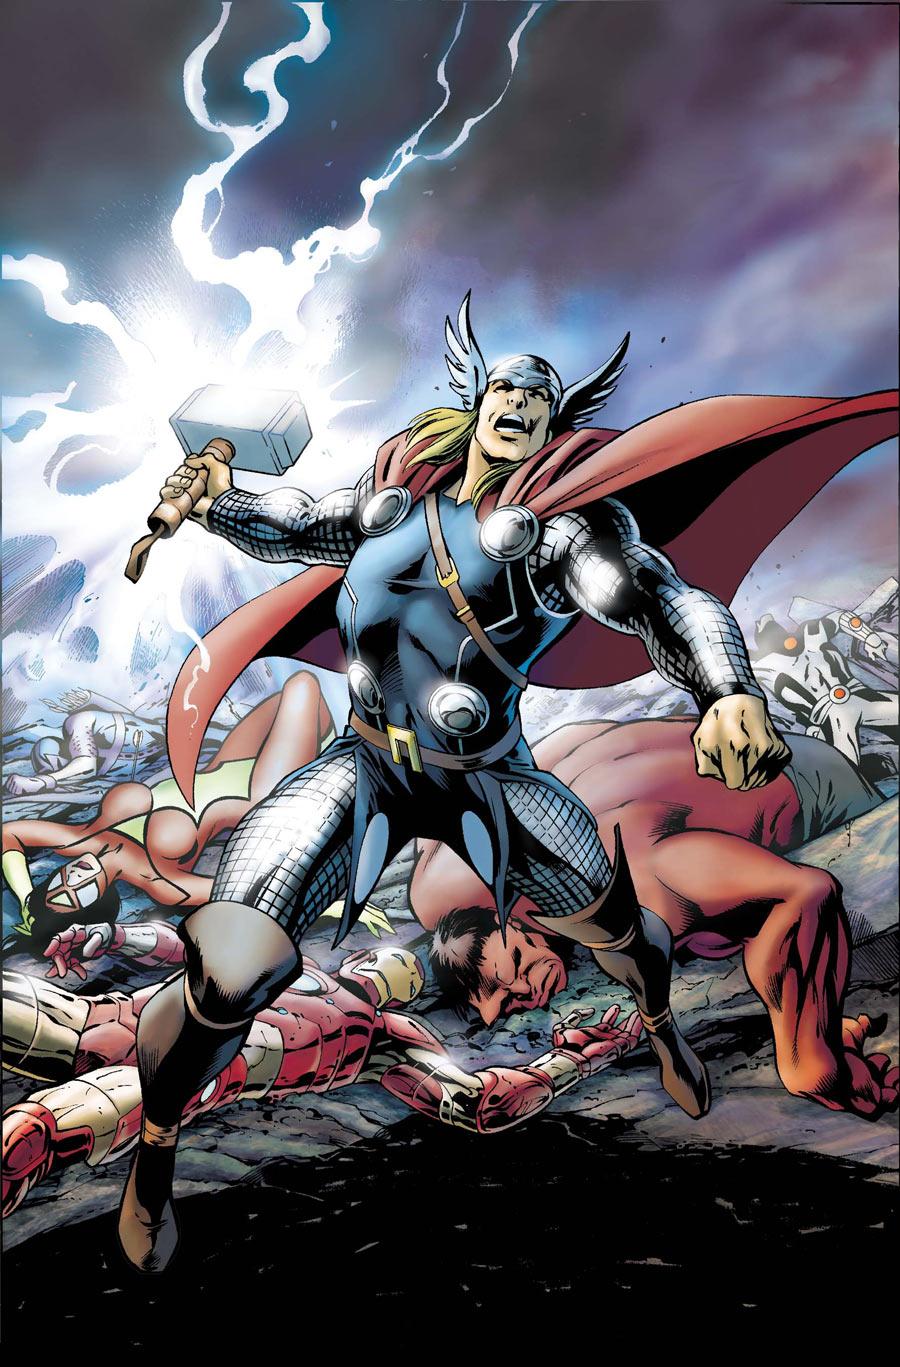 http://images.wikia.com/marveldatabase/images/8/8d/Avengers_Vol_4_13_Textless.jpg